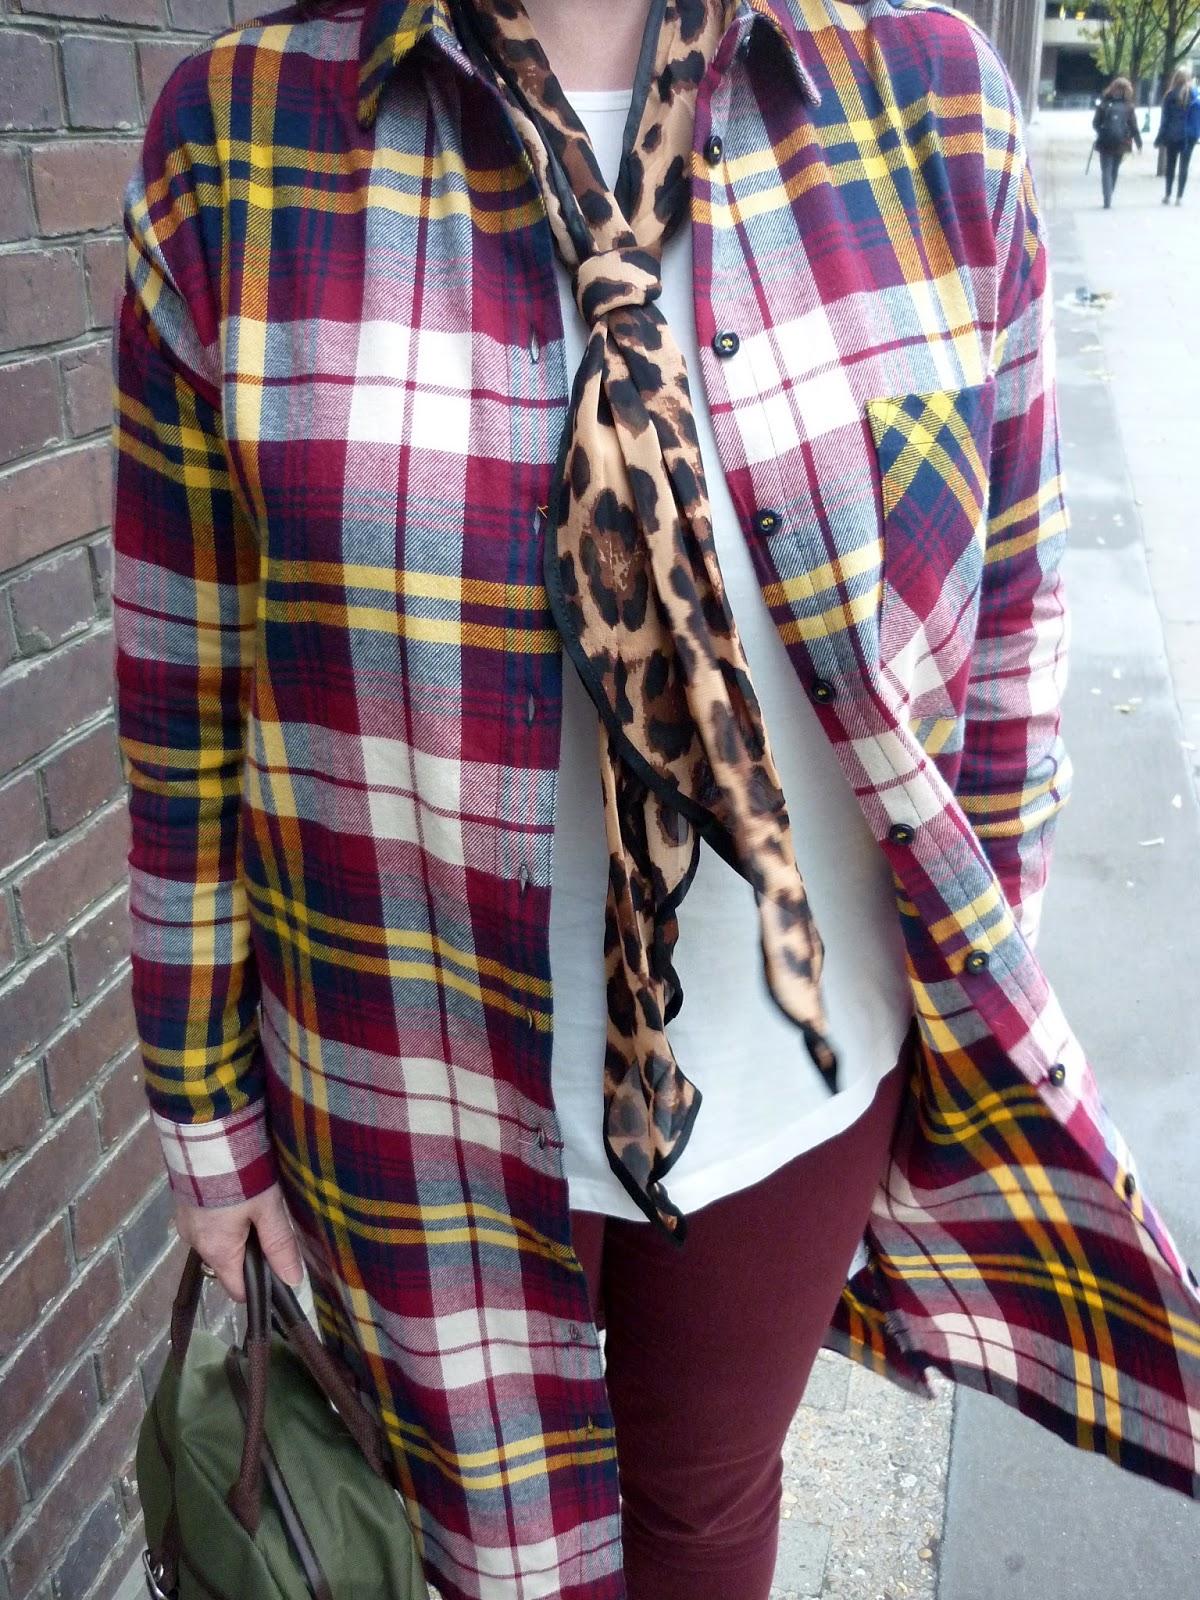 Oversized Tartan Shirt, Burgundy Jeans, Leopard Print Tie | Petite Silver Vixen